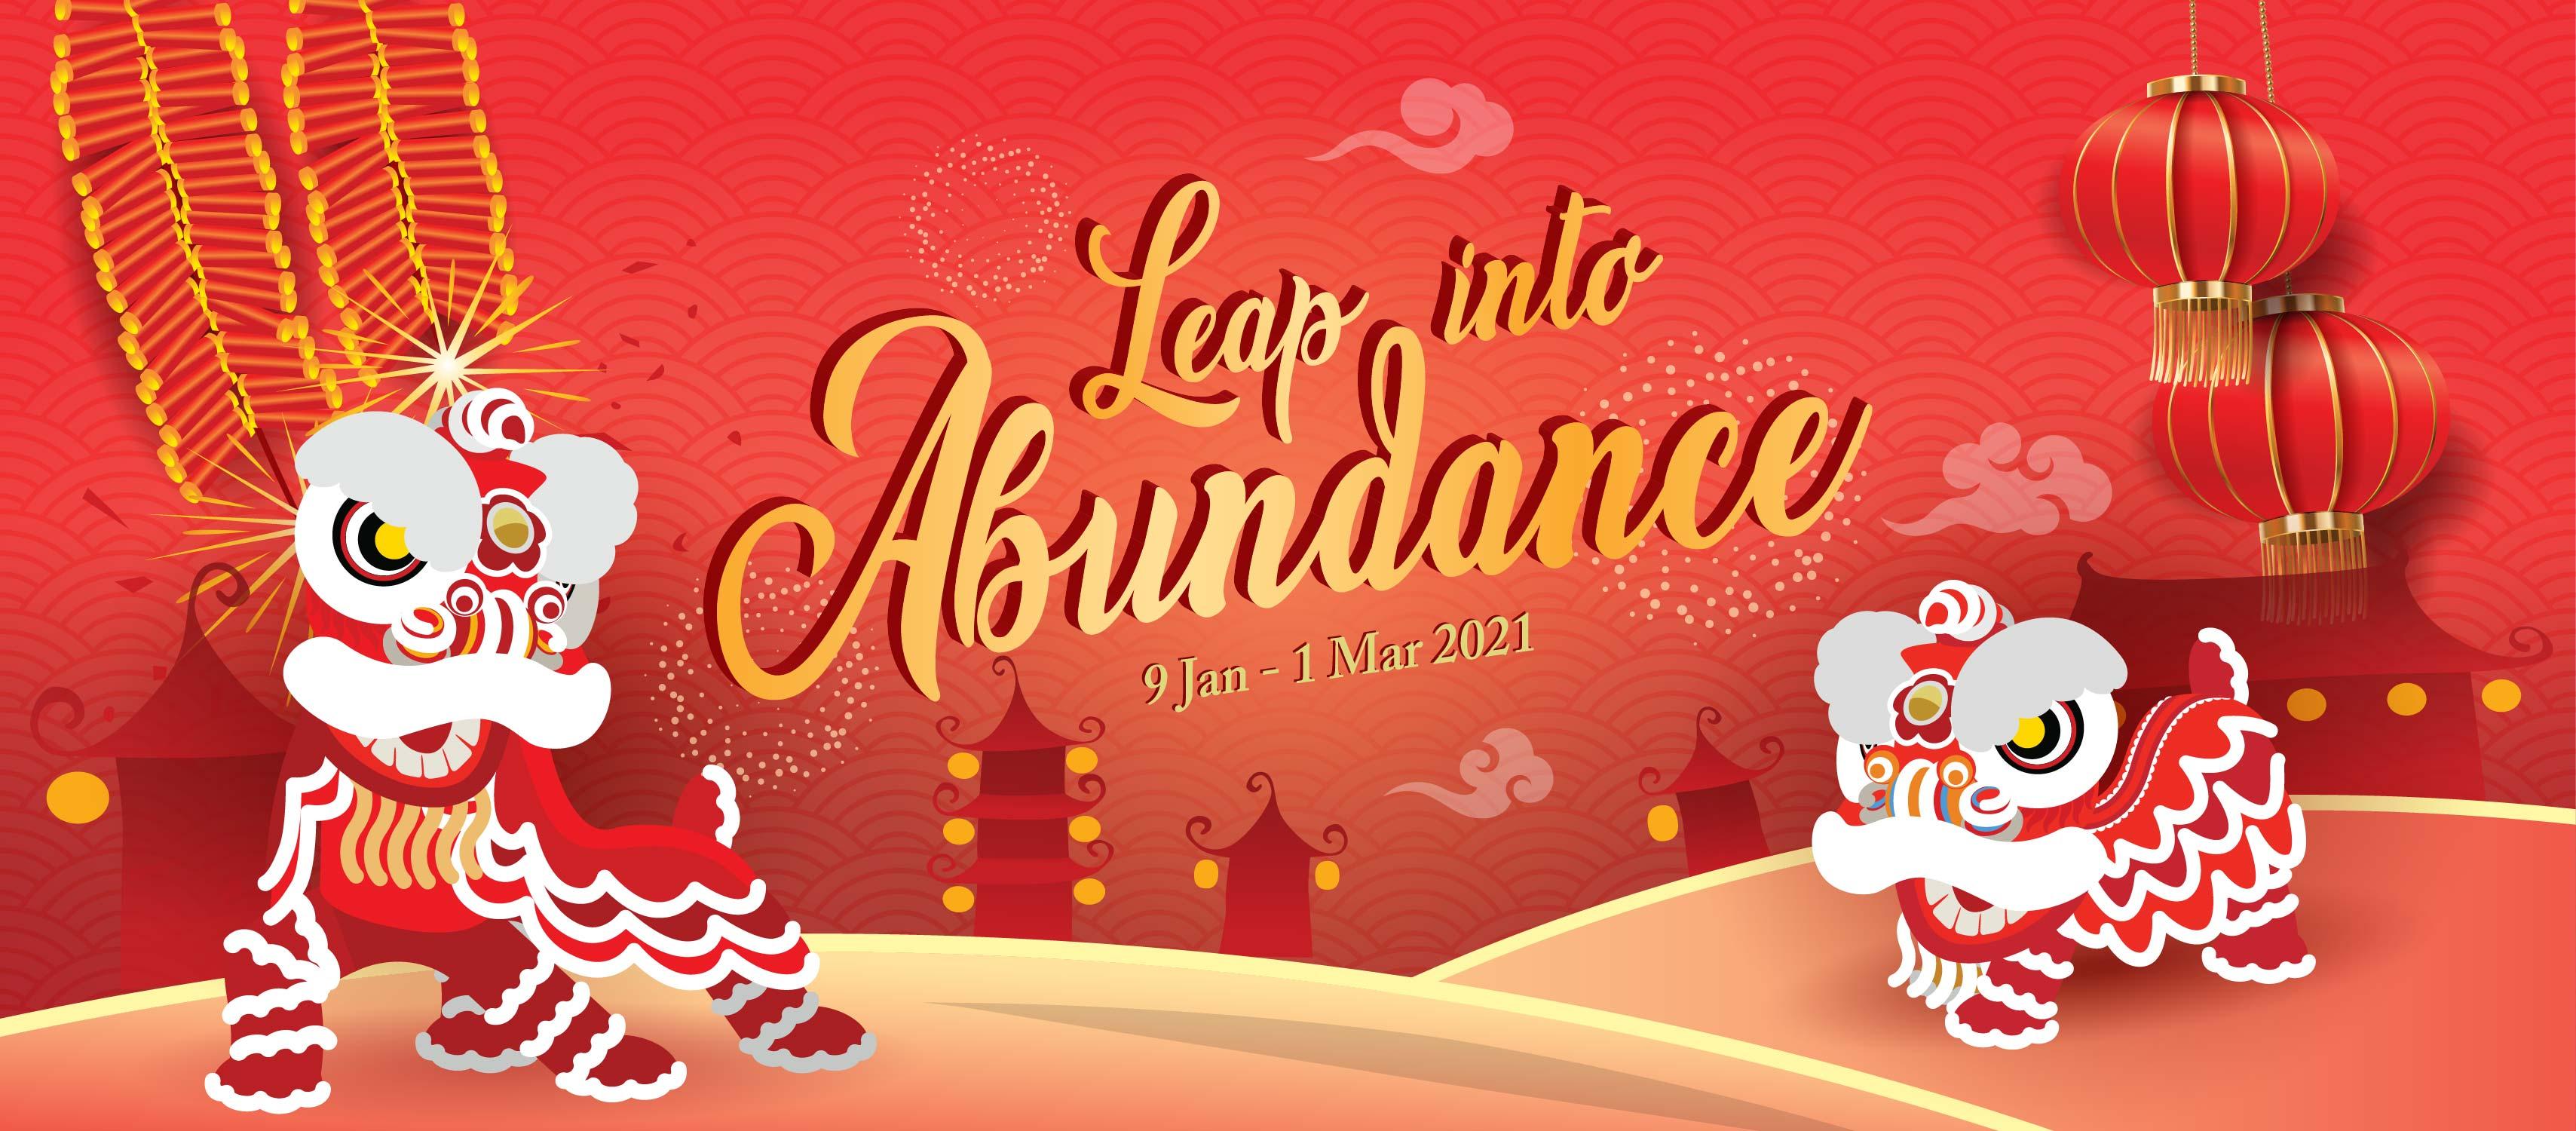 Leap Into Abundance Fb Cover-01